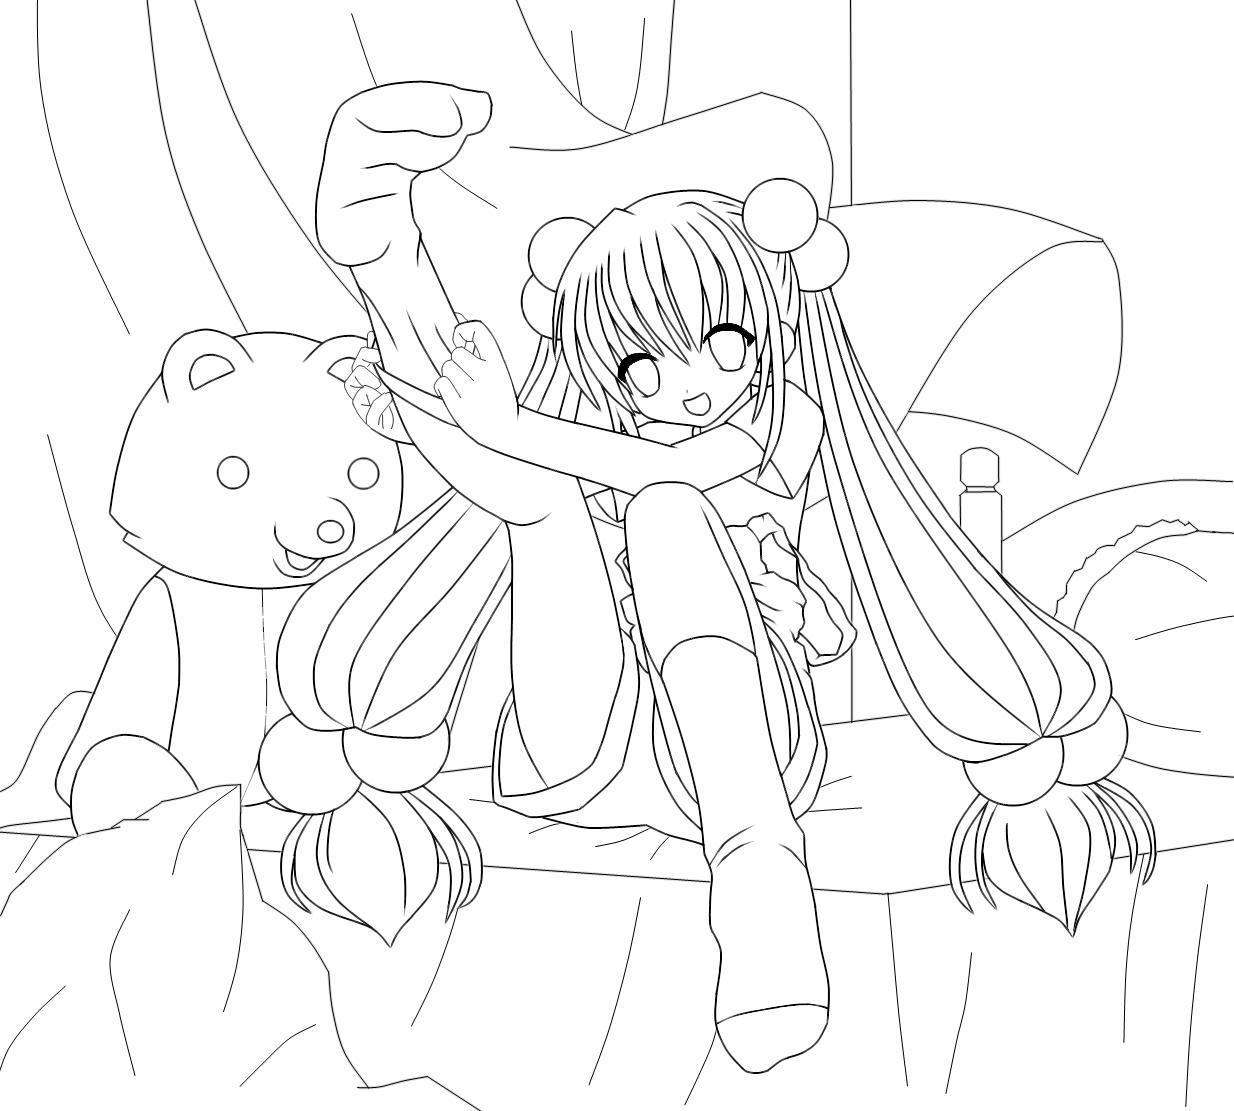 Kawaii anime girl lineart by Azrx004 on DeviantArt